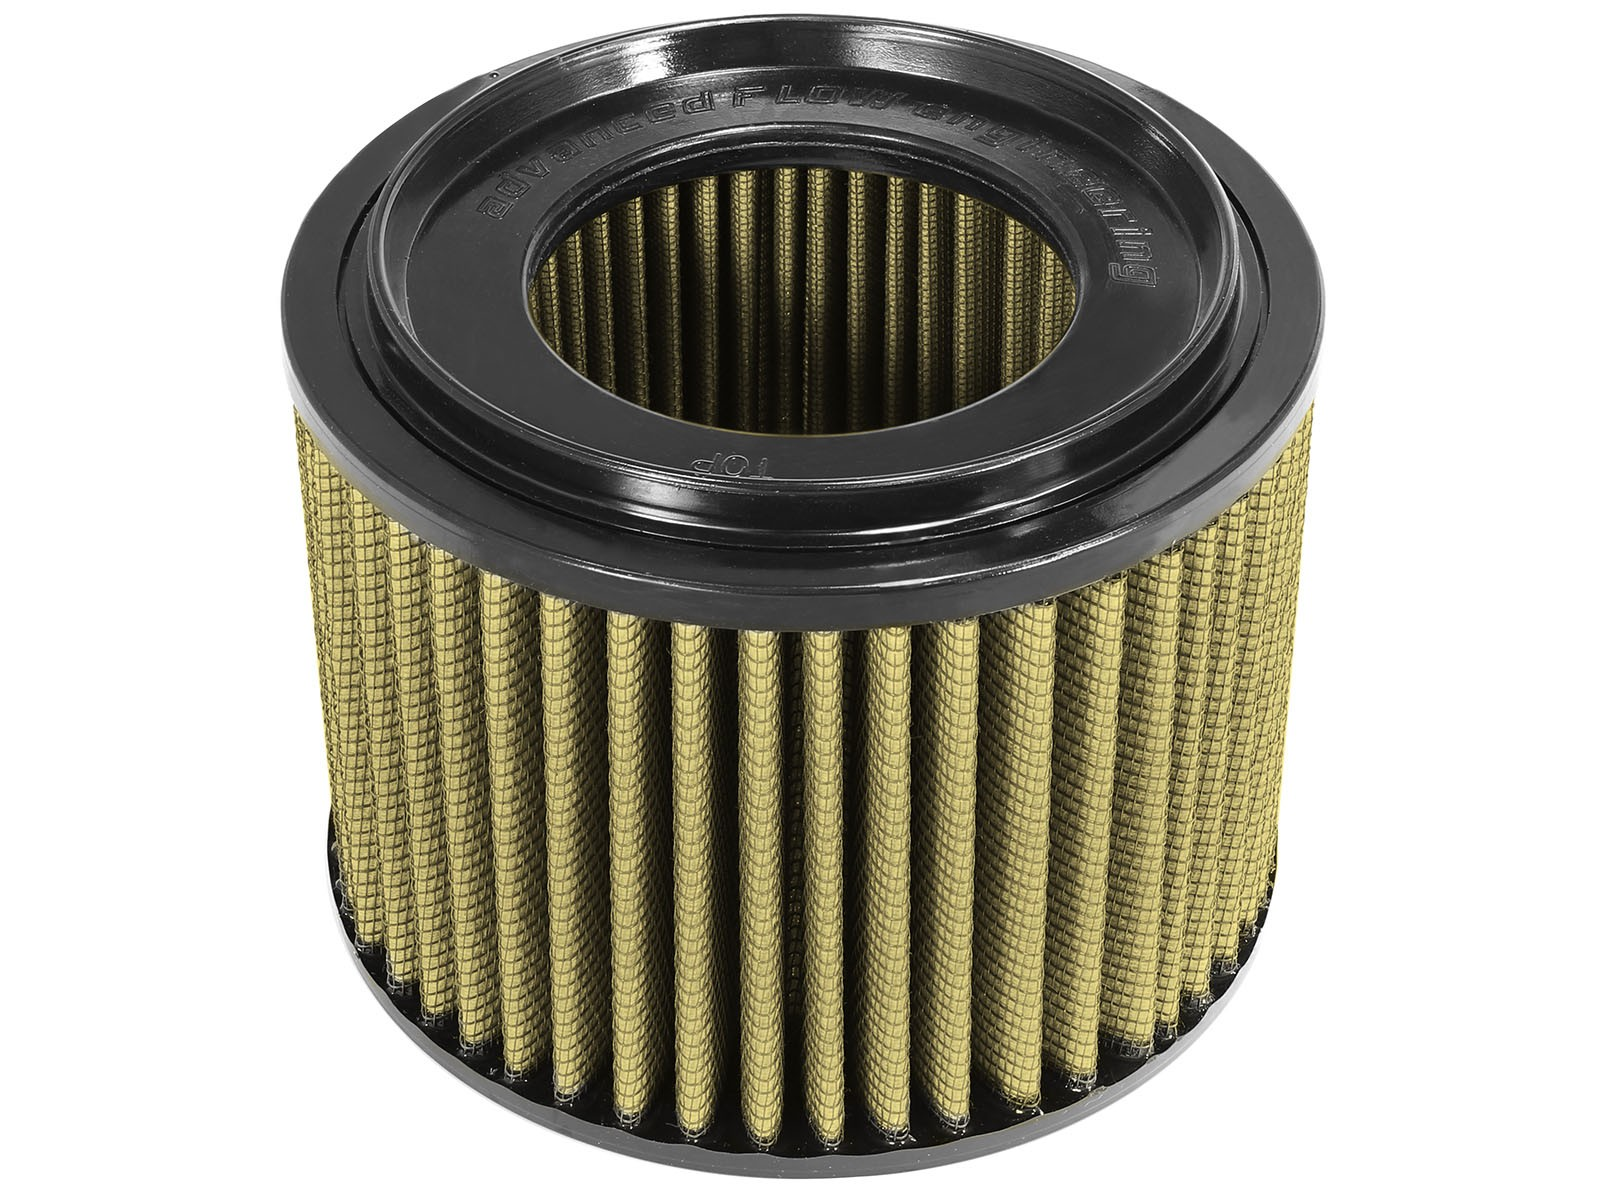 aFe POWER 71-10104 Magnum FLOW Pro GUARD7 Air Filter